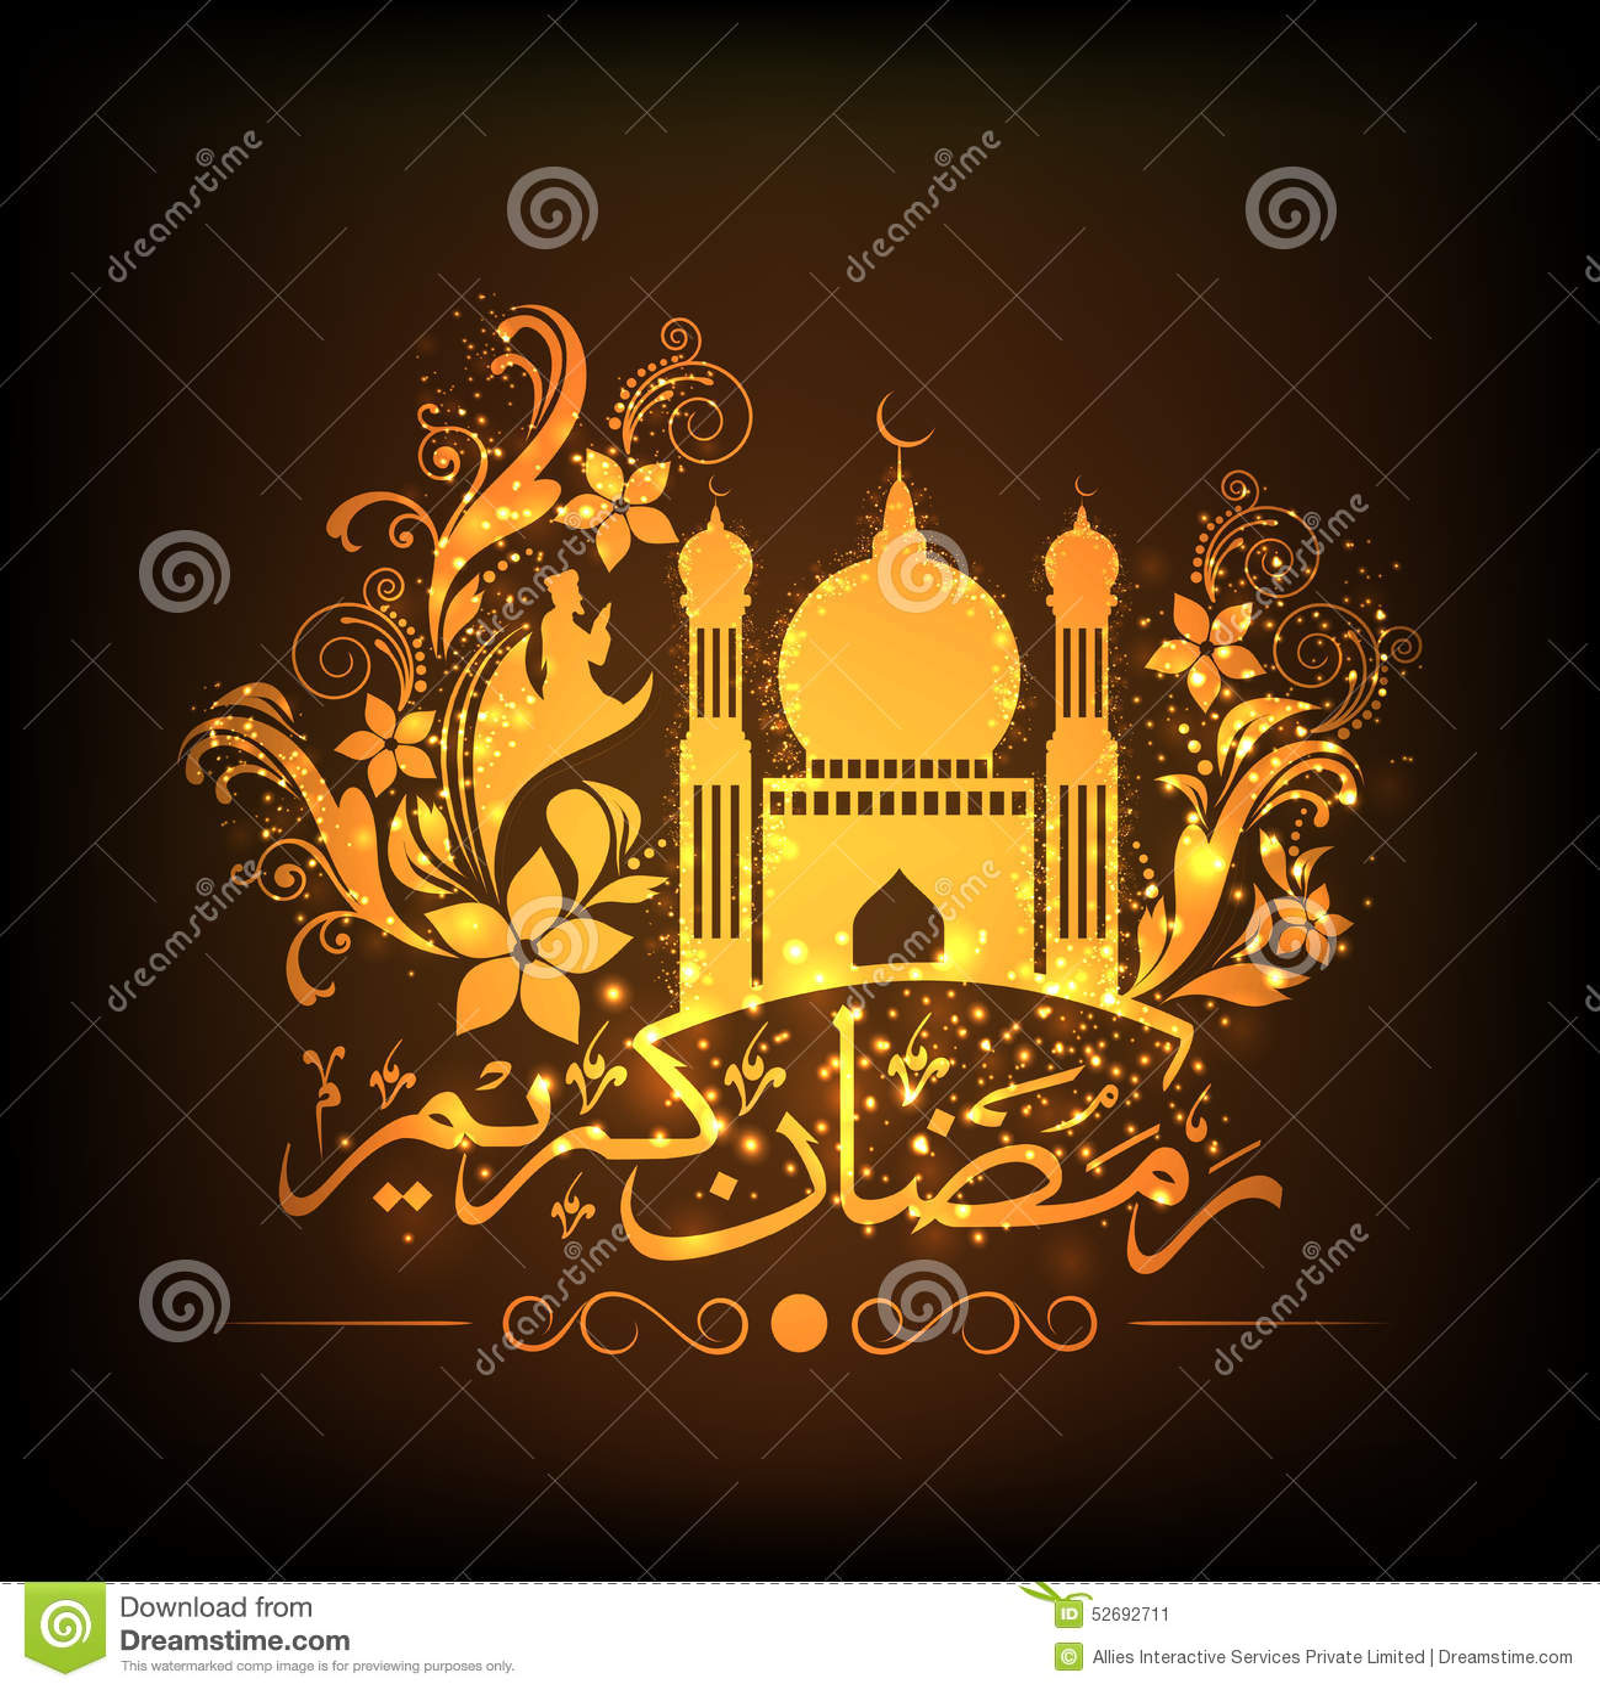 Arabic Islamic Calligraphy Of Golden Text Ramadan Kareem Stock